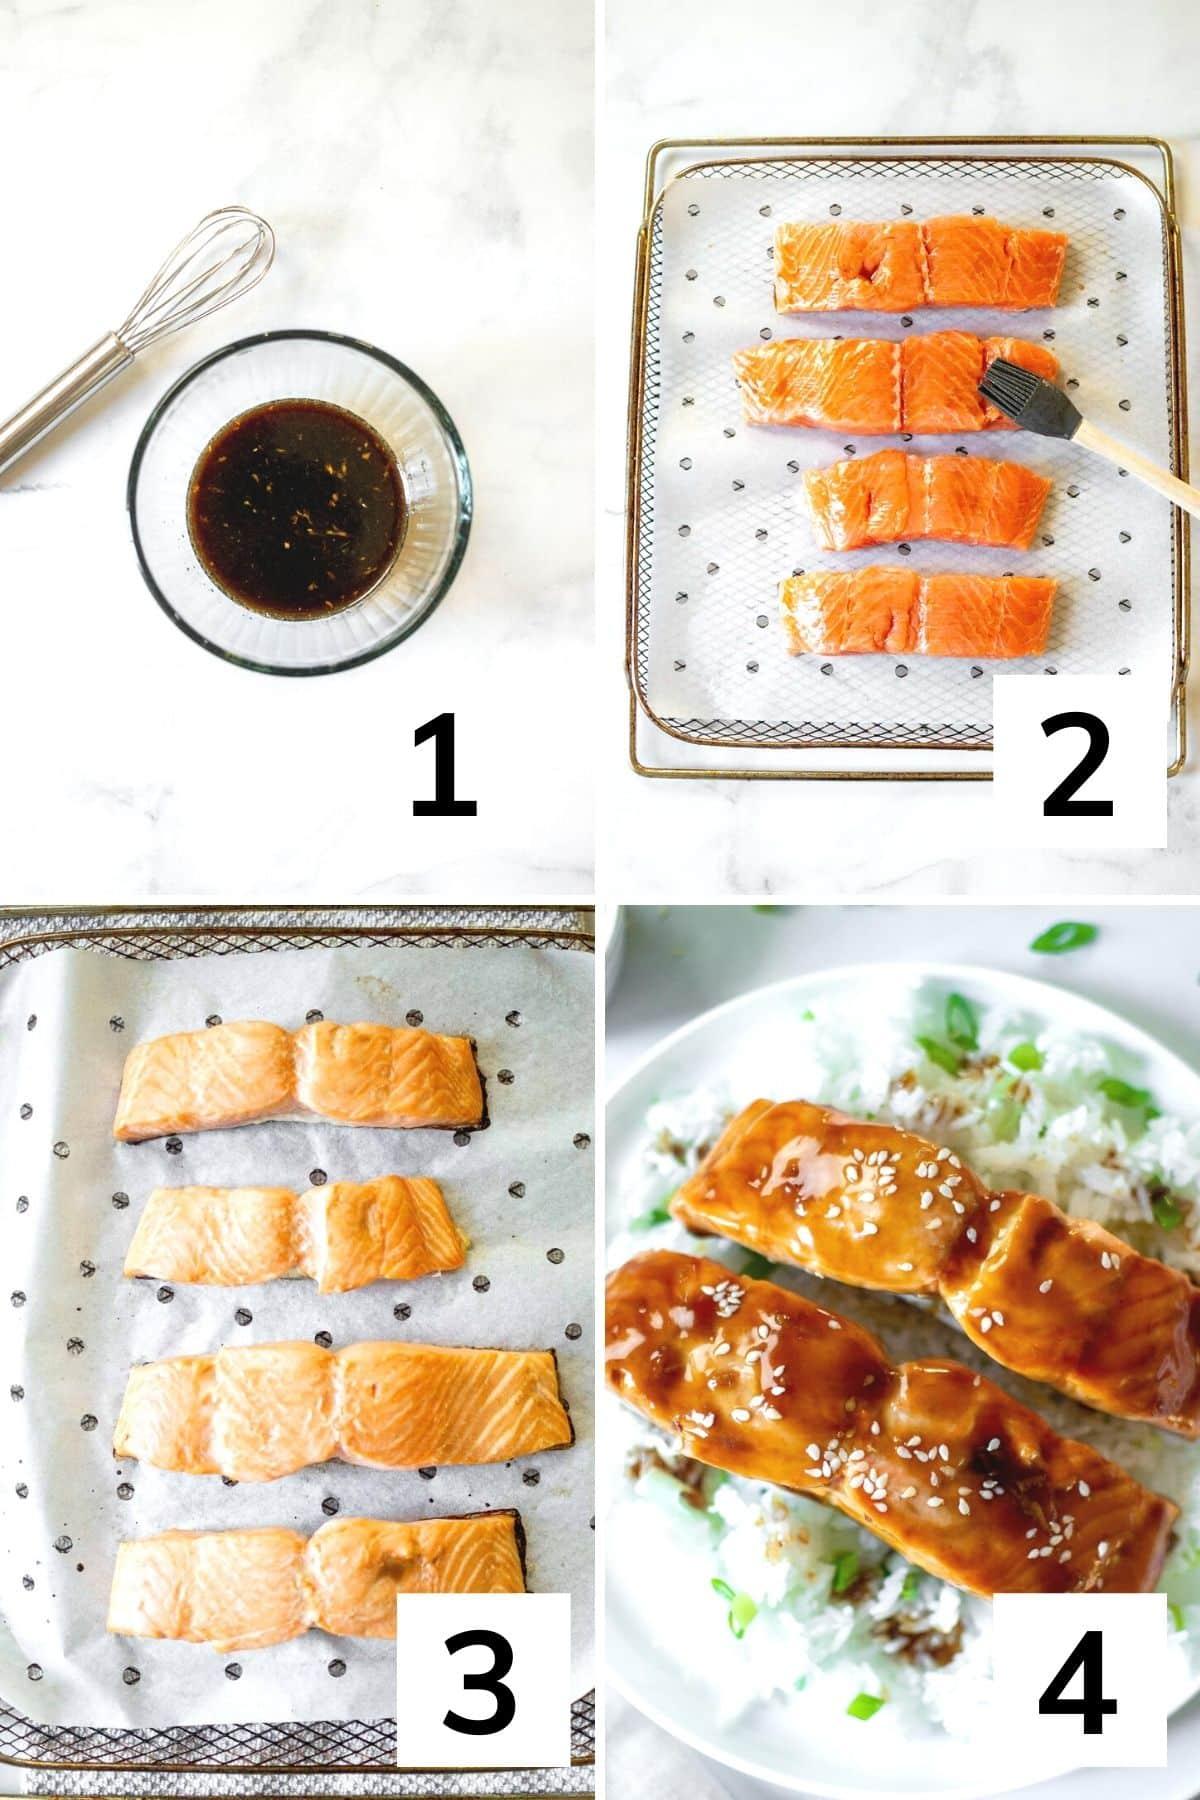 How to make Air Fryer Teriyaki Salmon step by step